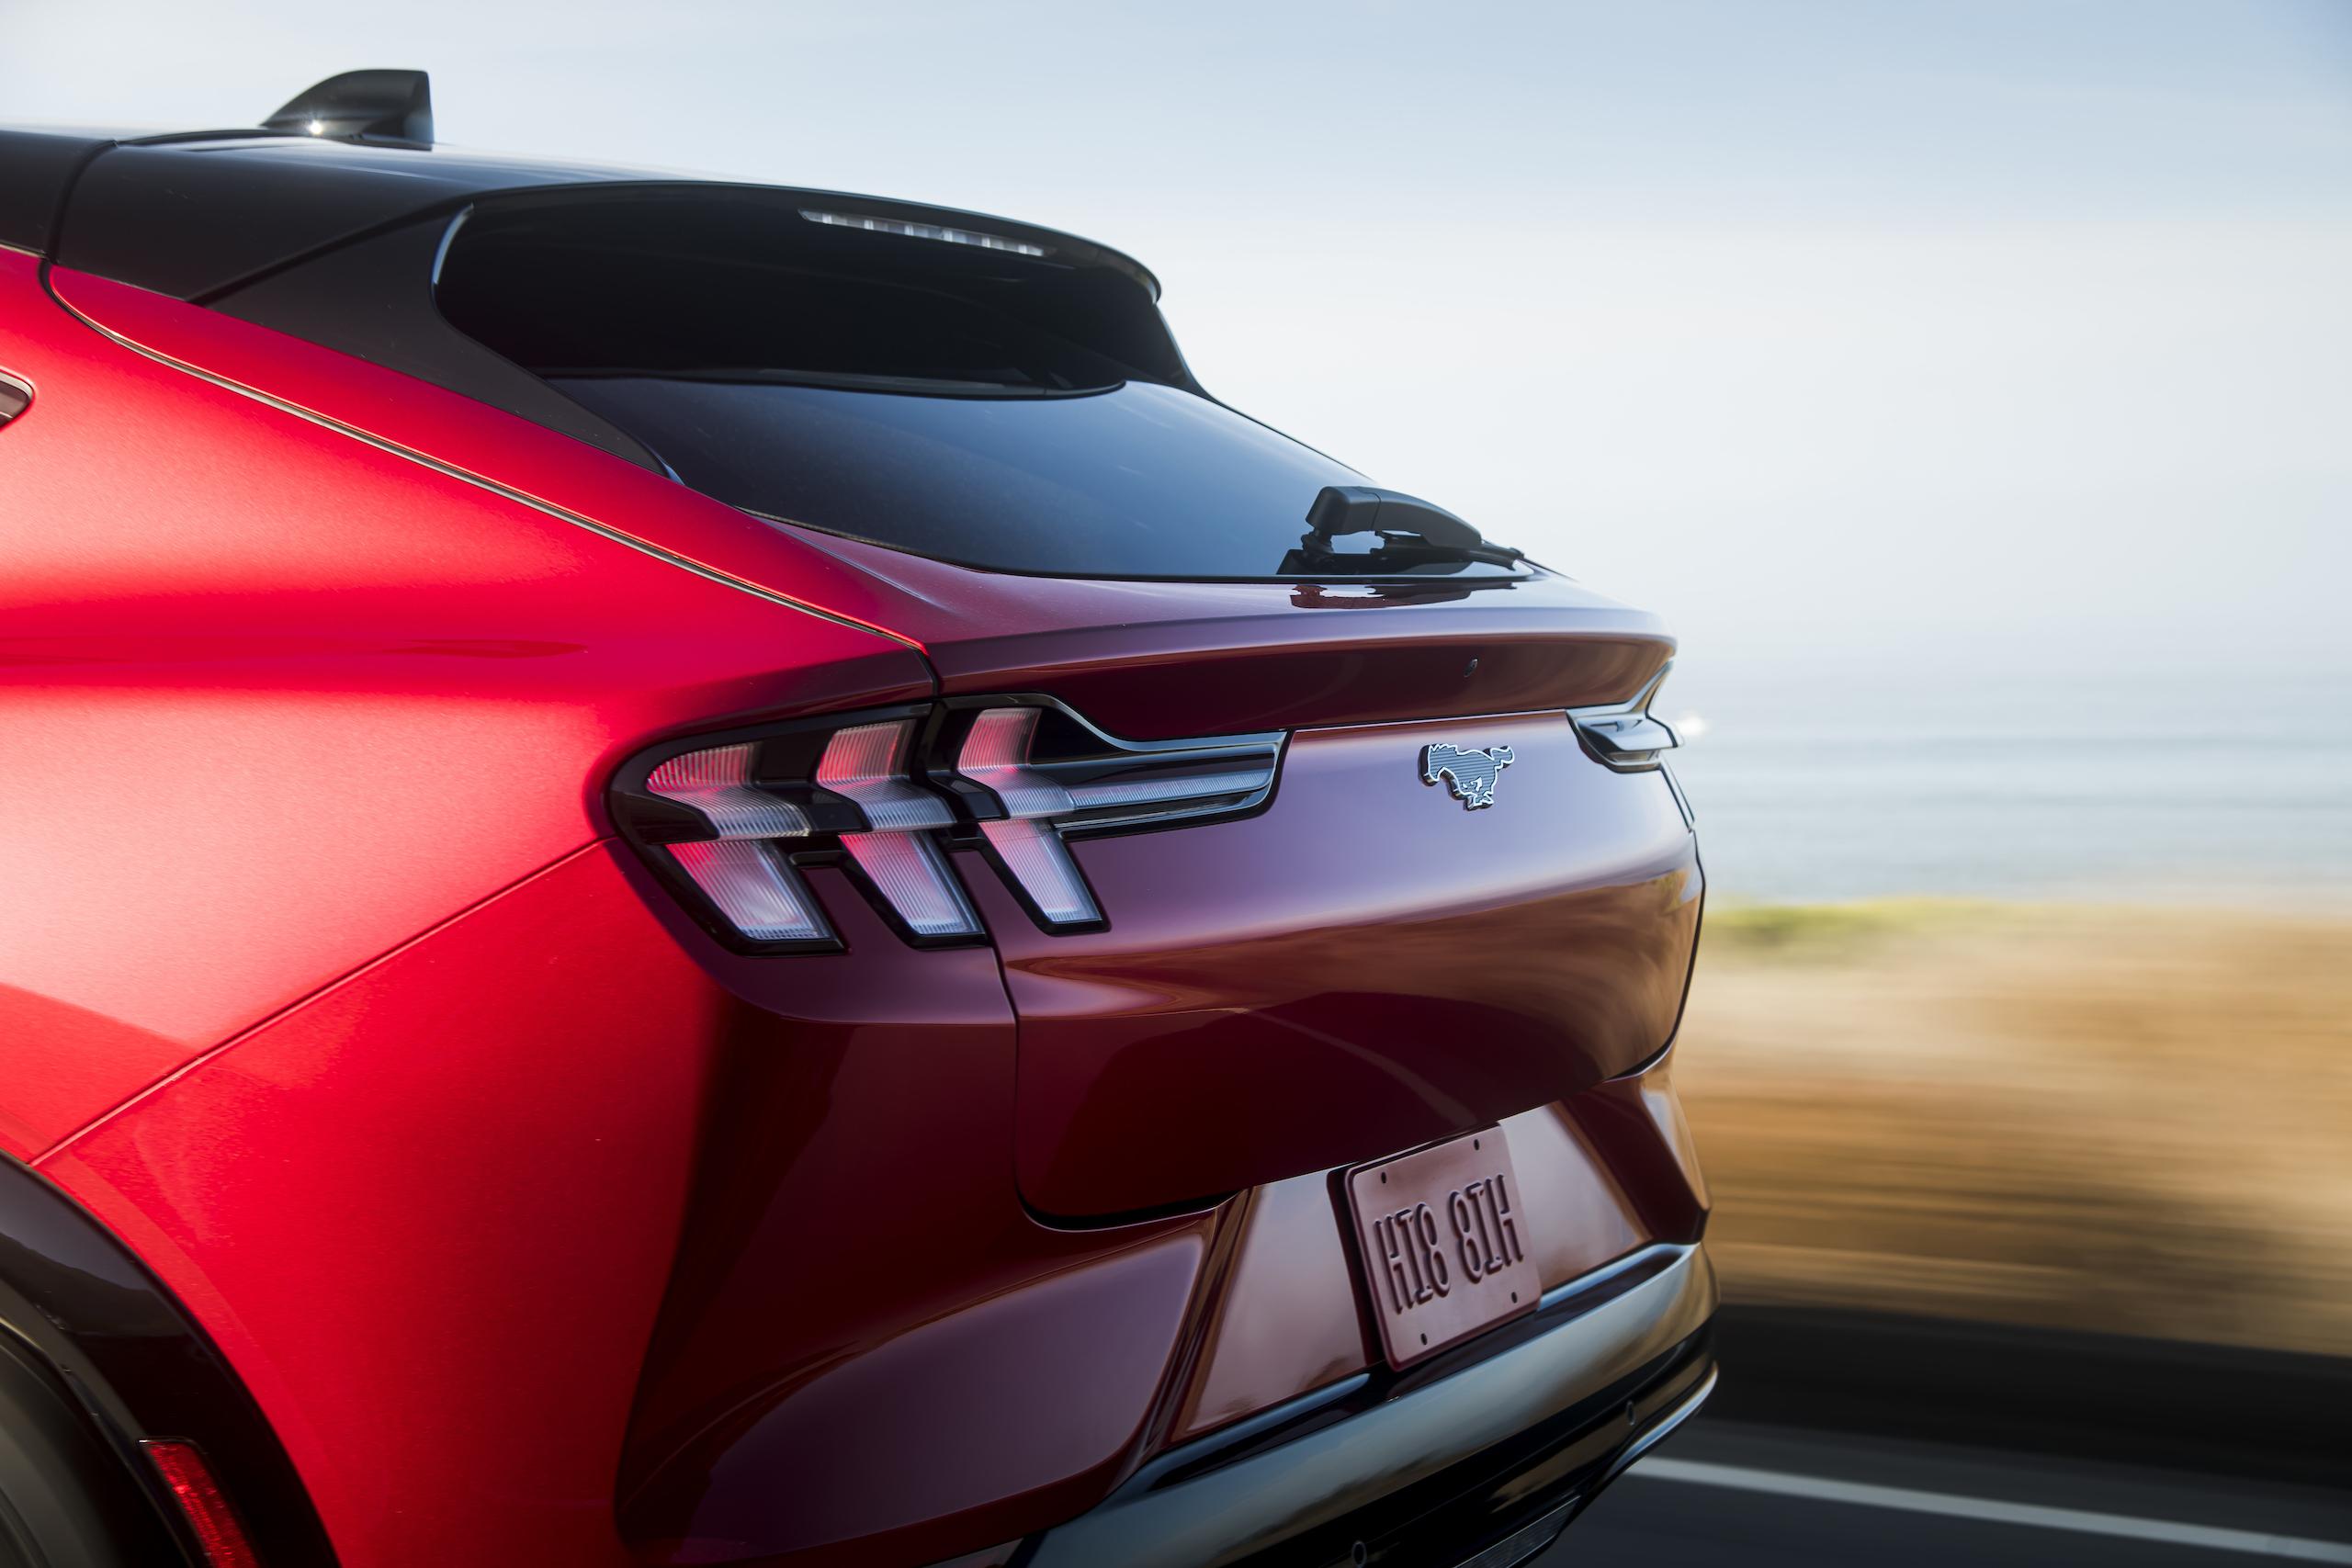 Mustang Mach-E rear fascia detail